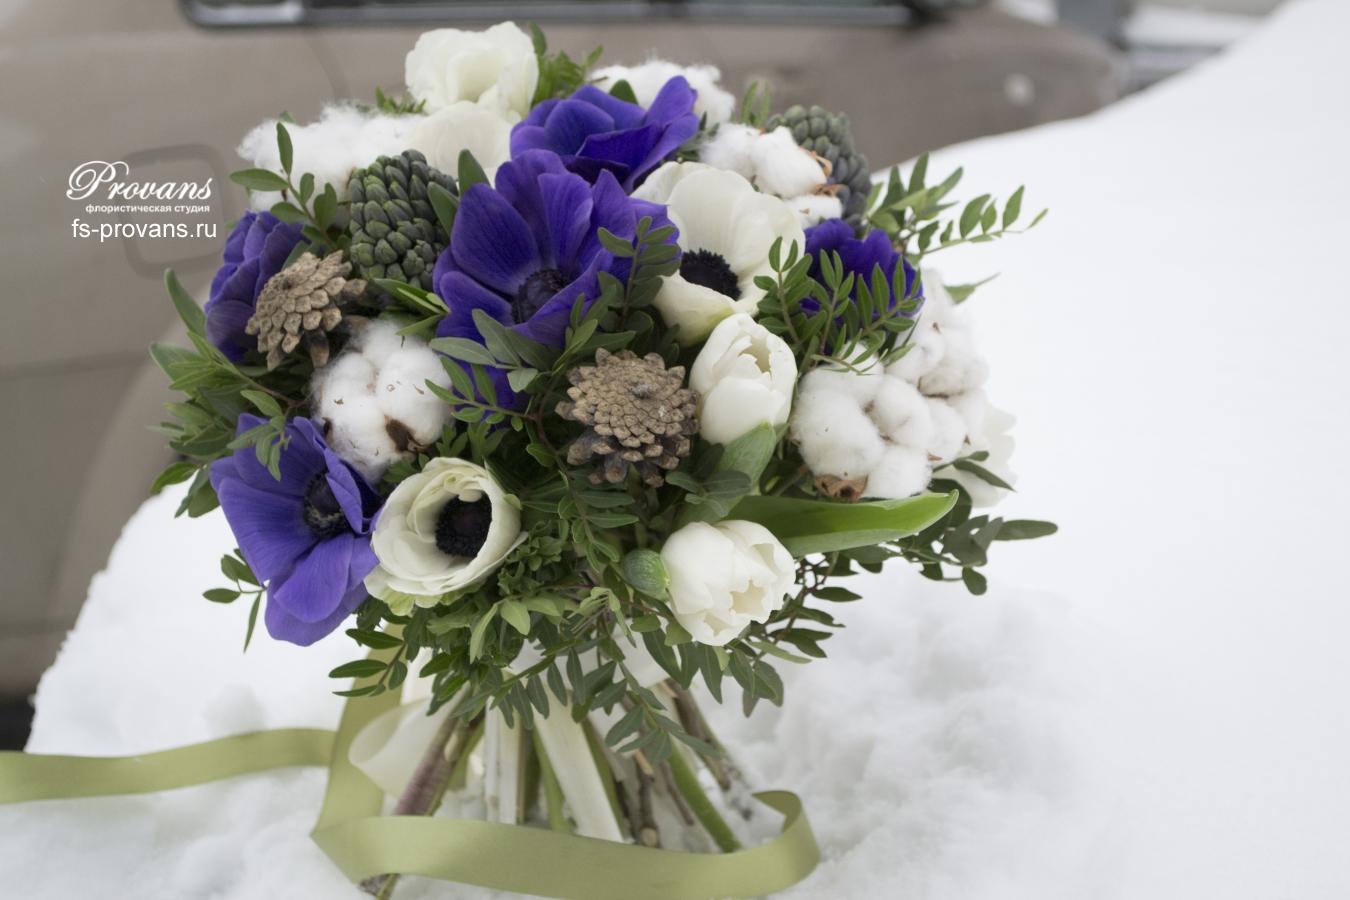 Букет невесты. Анемоны, гиацинты, тюльпаны